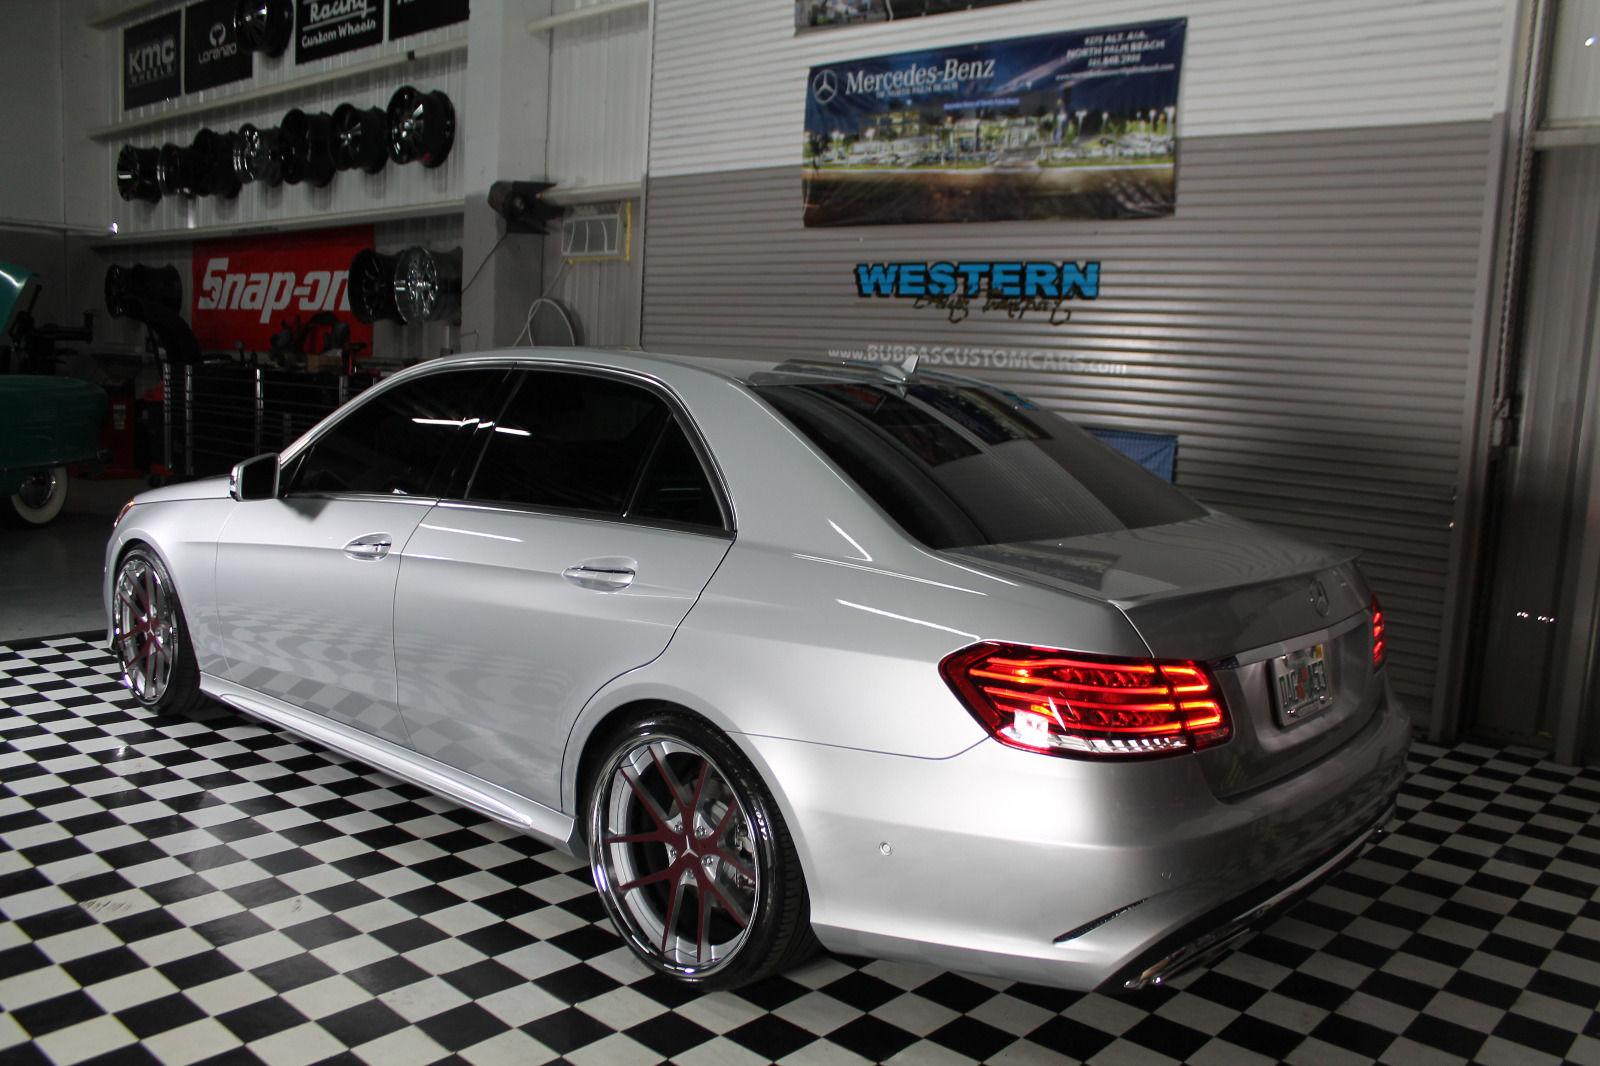 2014 Mercedes-Benz W212 E350 COR Wheels | BENZTUNING